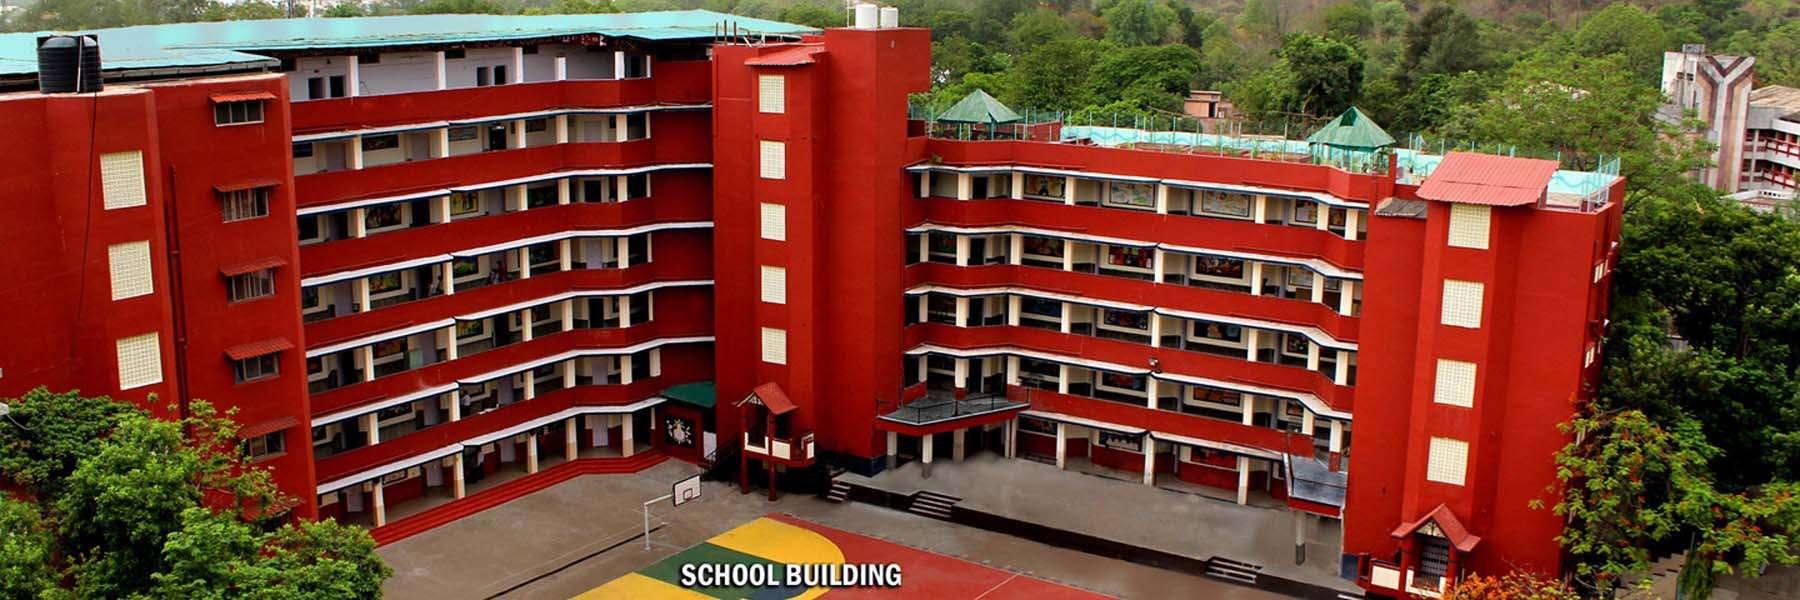 CENTRE POINT SCHOOL KATOL ROAD NAGPUR MAHARASHTRA 1130021